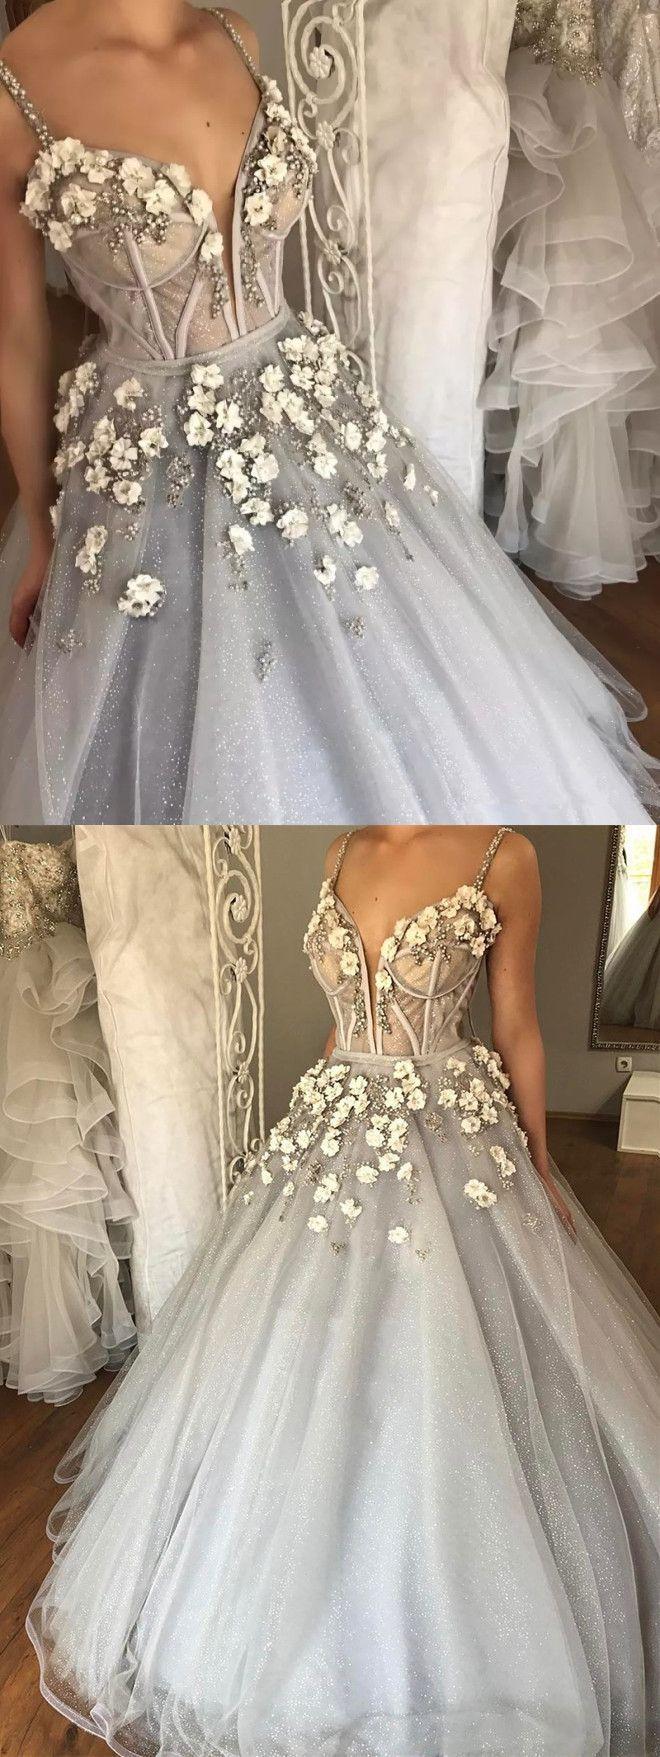 2017 wedding dresses,unique wedding dresses,princess wedding ...